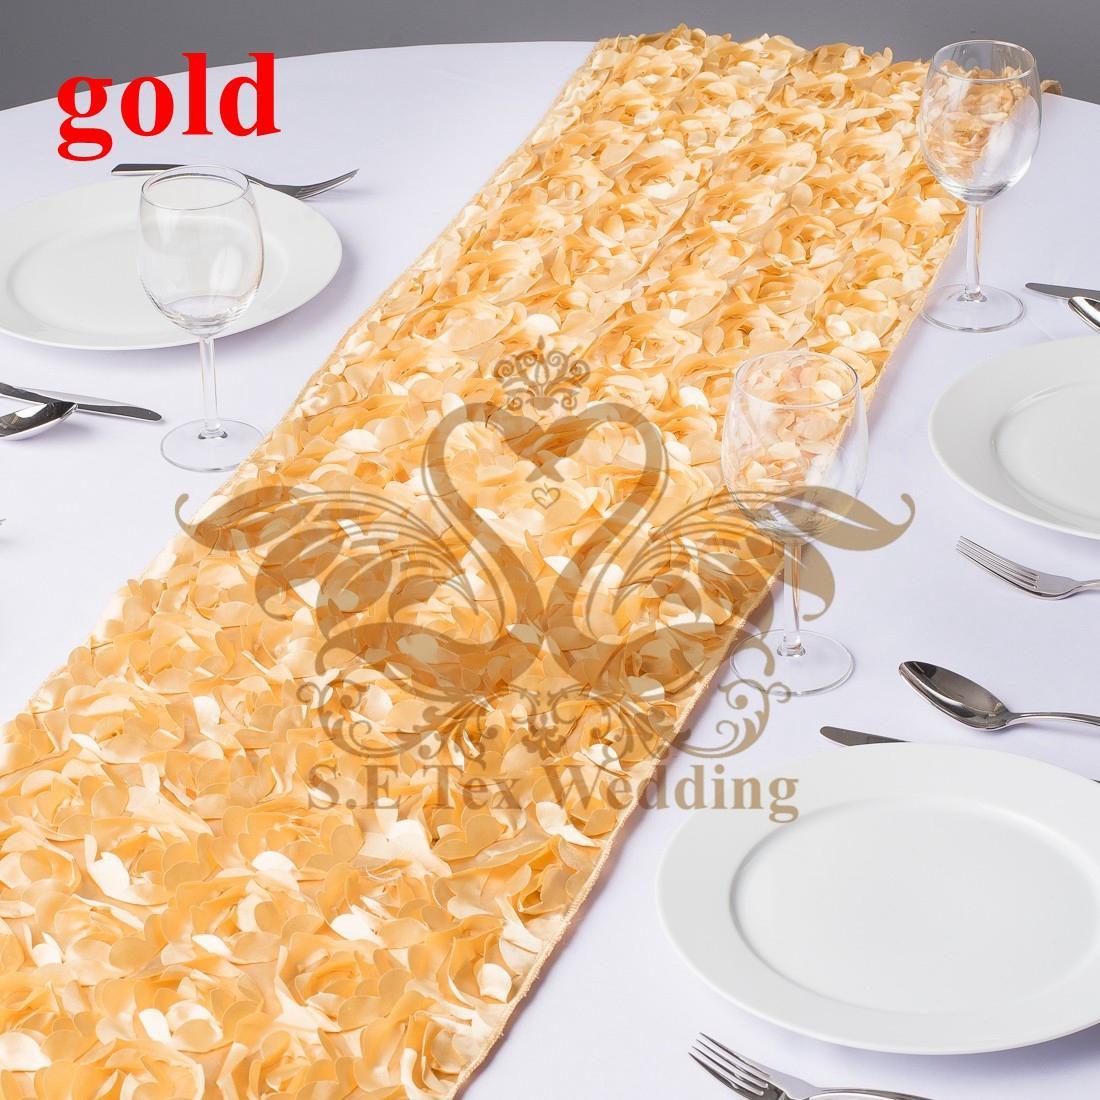 New Design Satin Rosette Table Runner For Wedding Decoration - Gold Color